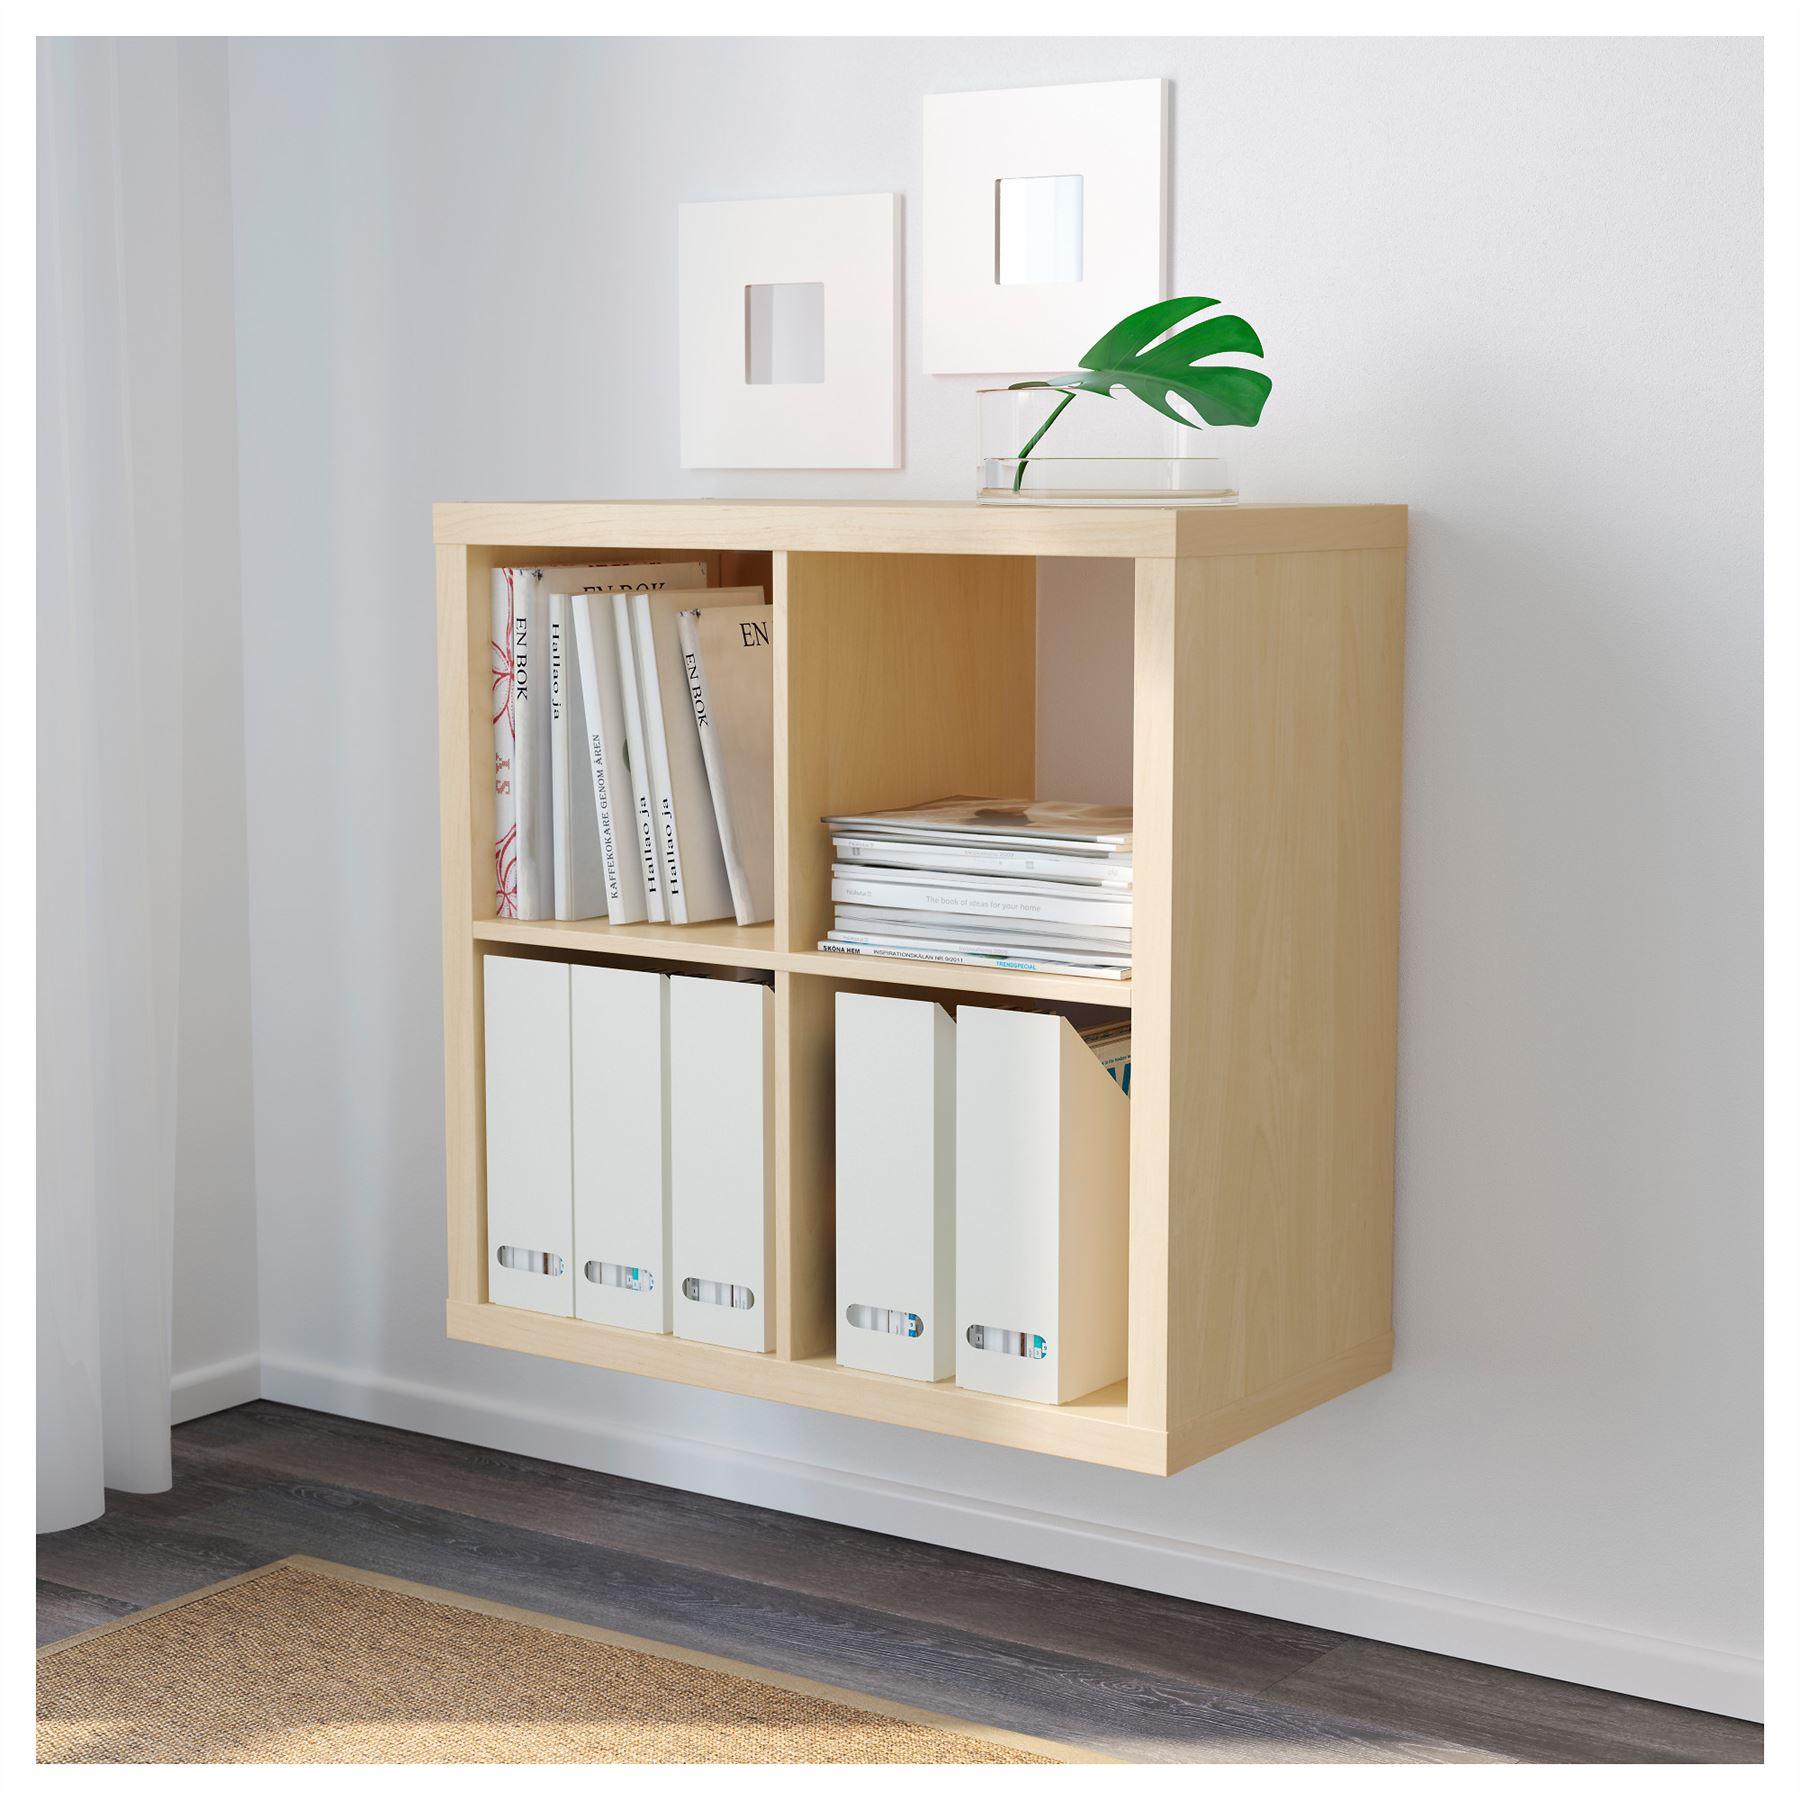 ikea kallax 4 cube storage bookcase square shelving unit various colours. Black Bedroom Furniture Sets. Home Design Ideas